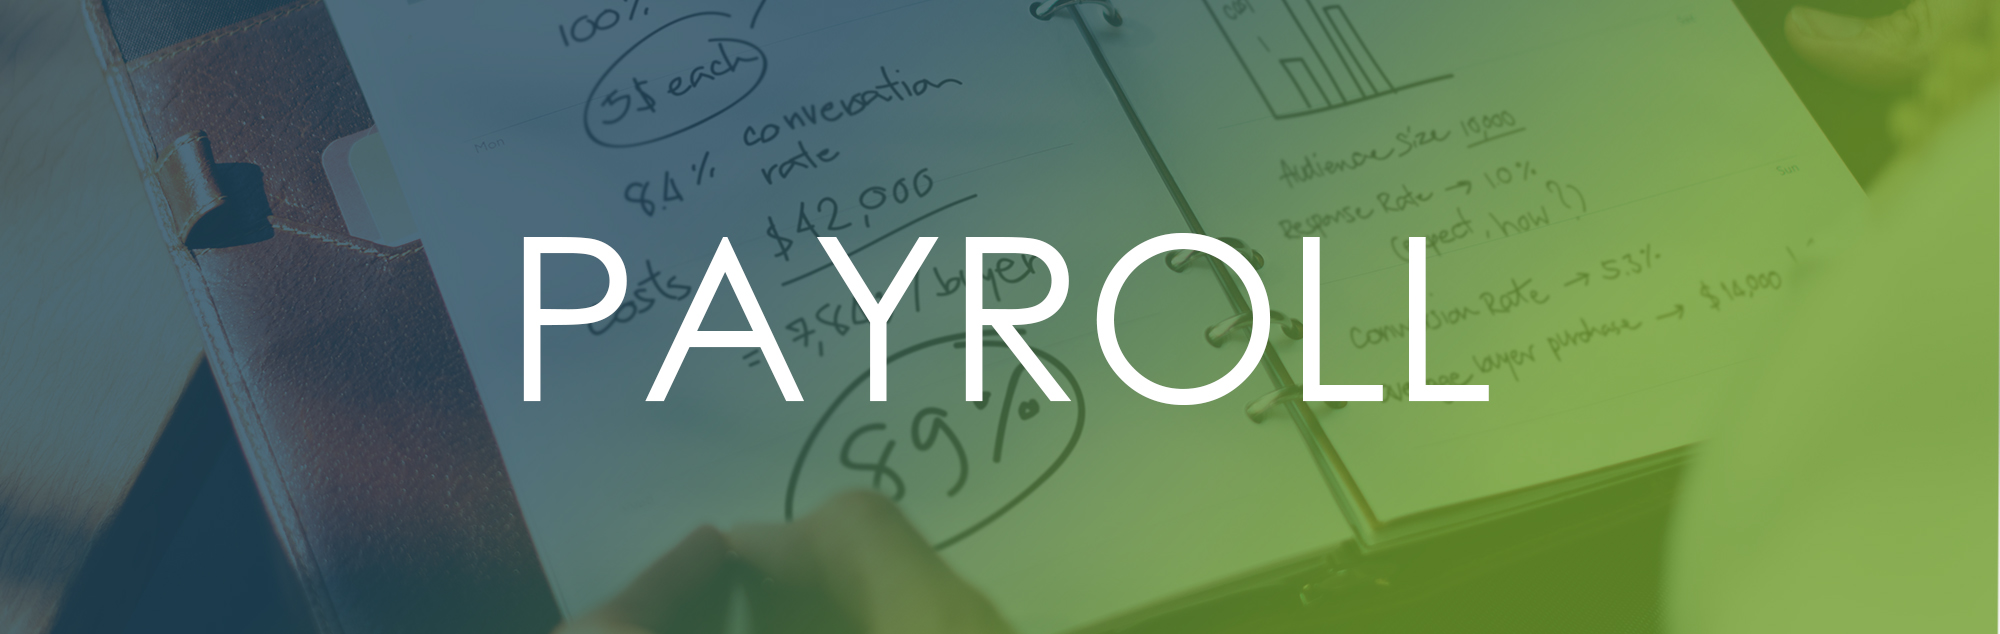 payroll-2.jpg